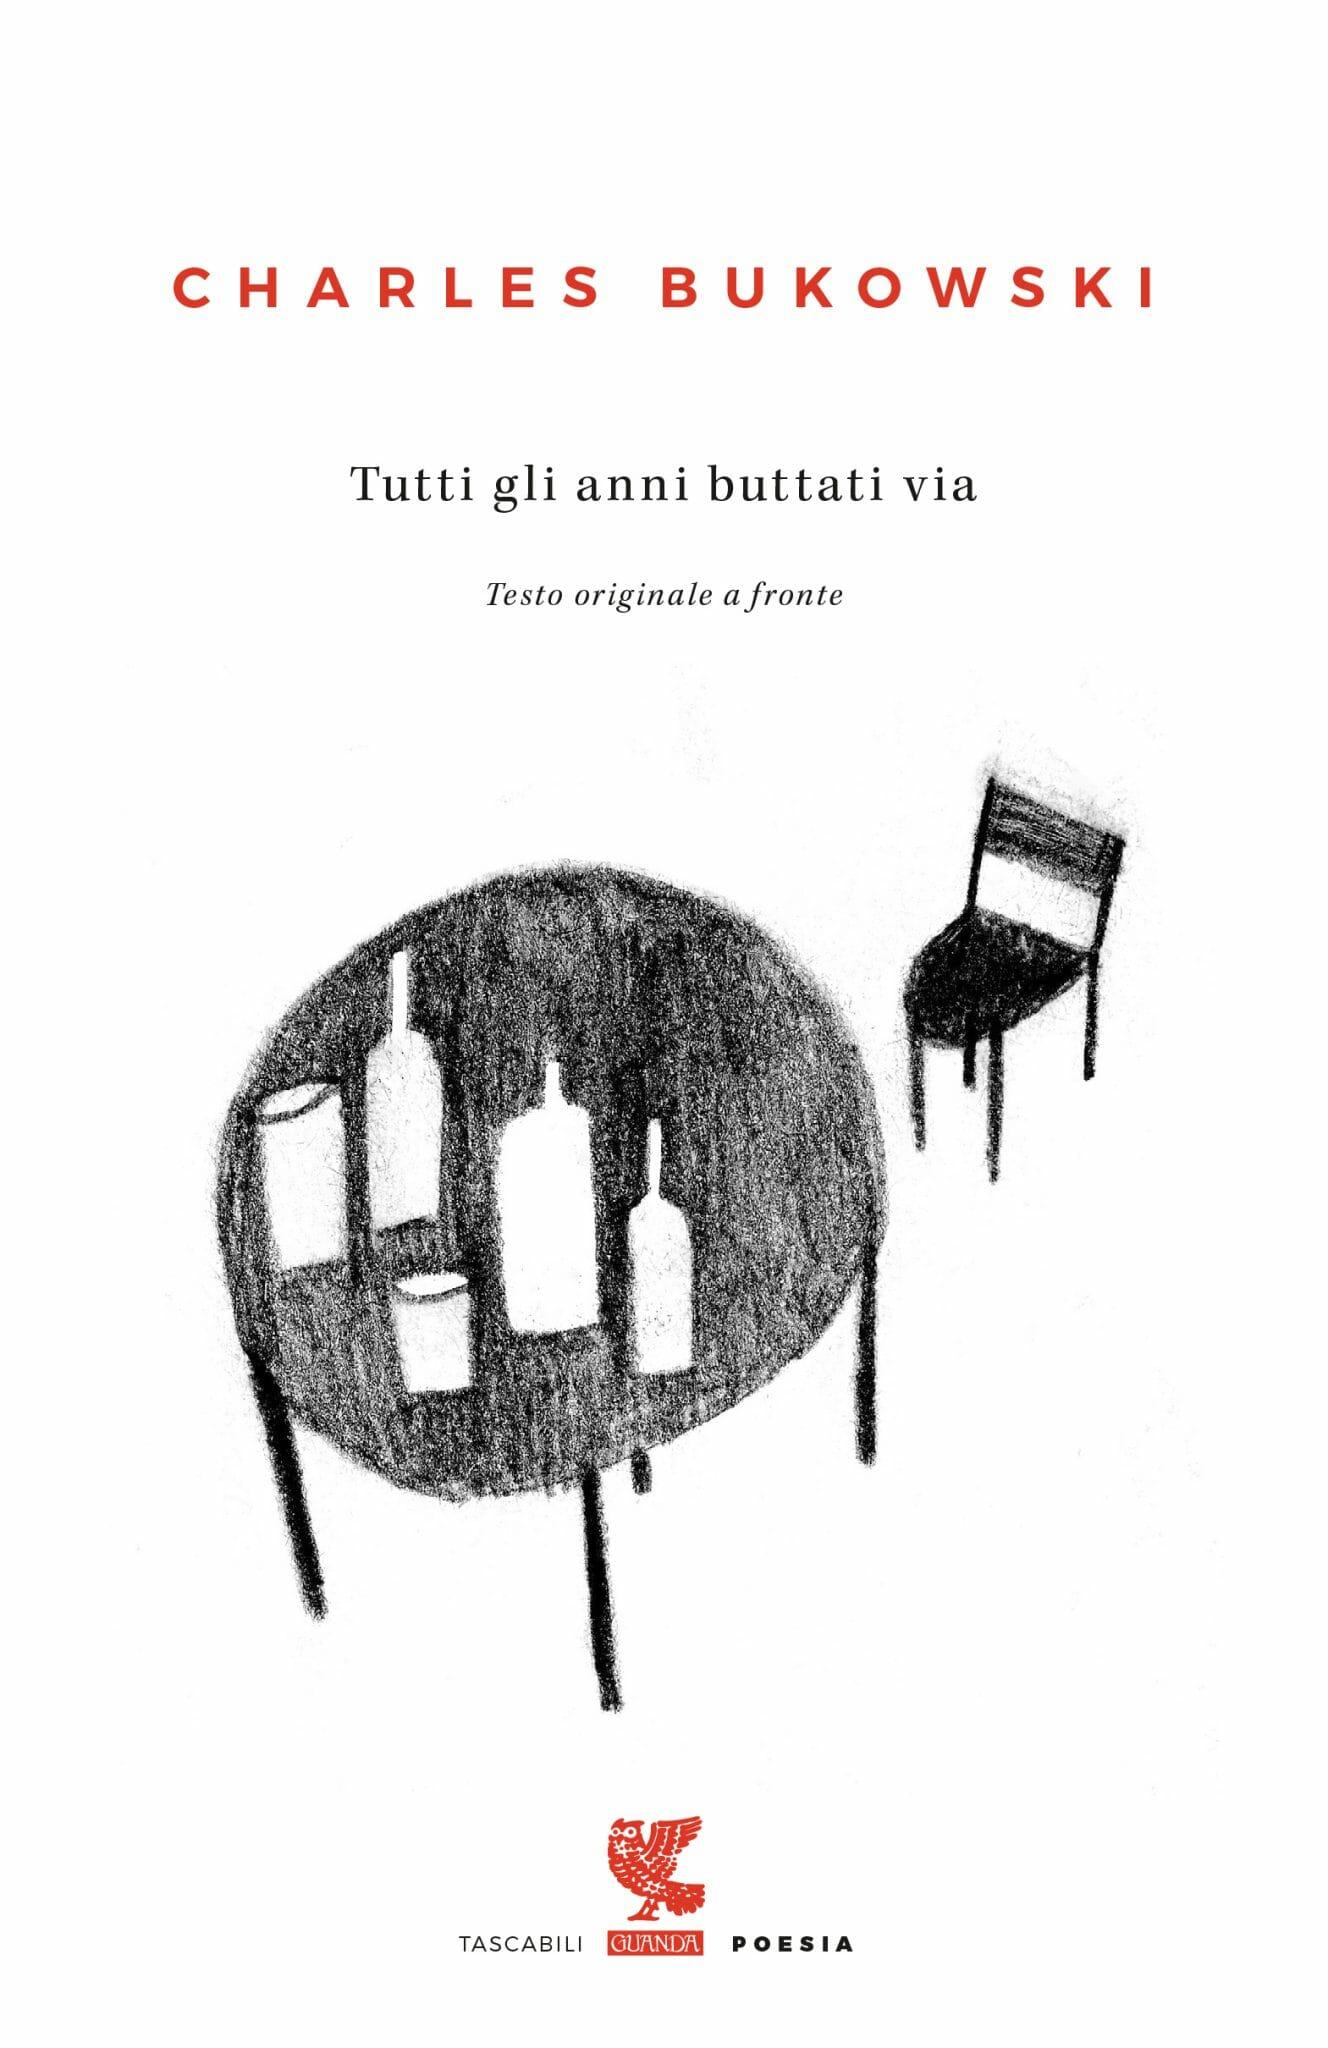 Bukowski poesie guanda